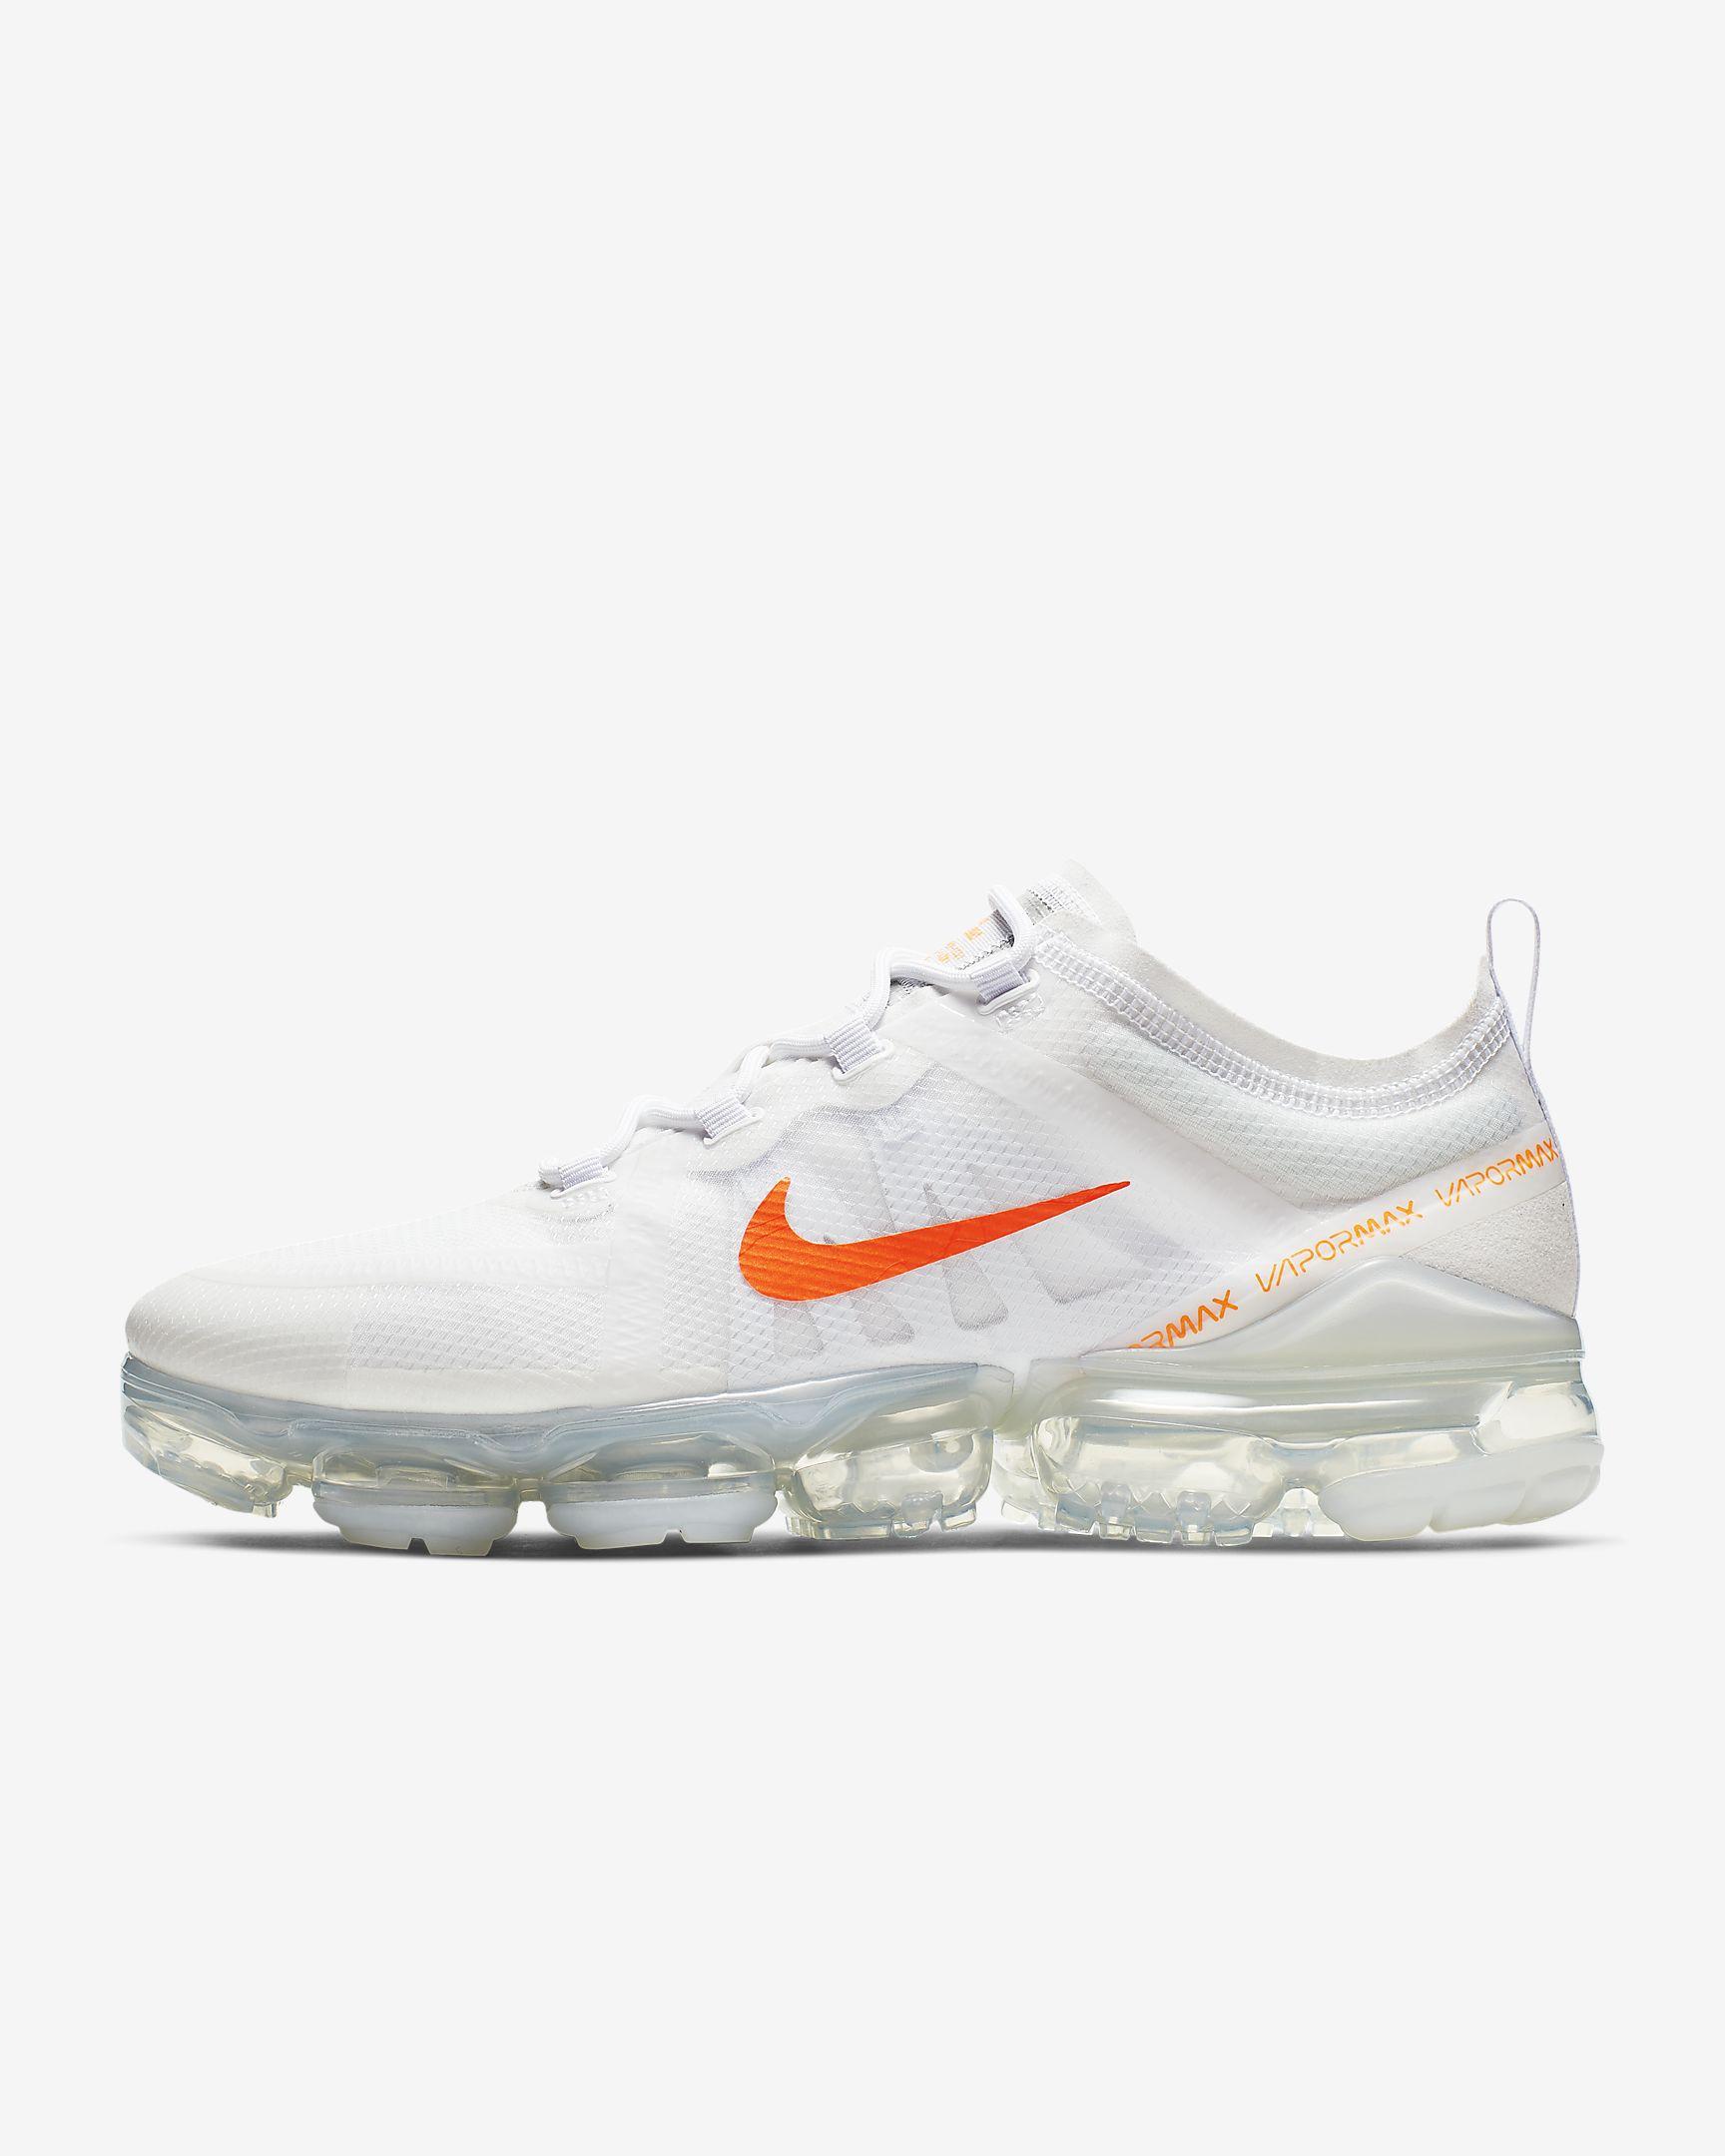 Nike Air VaporMax 2019 'White/Total